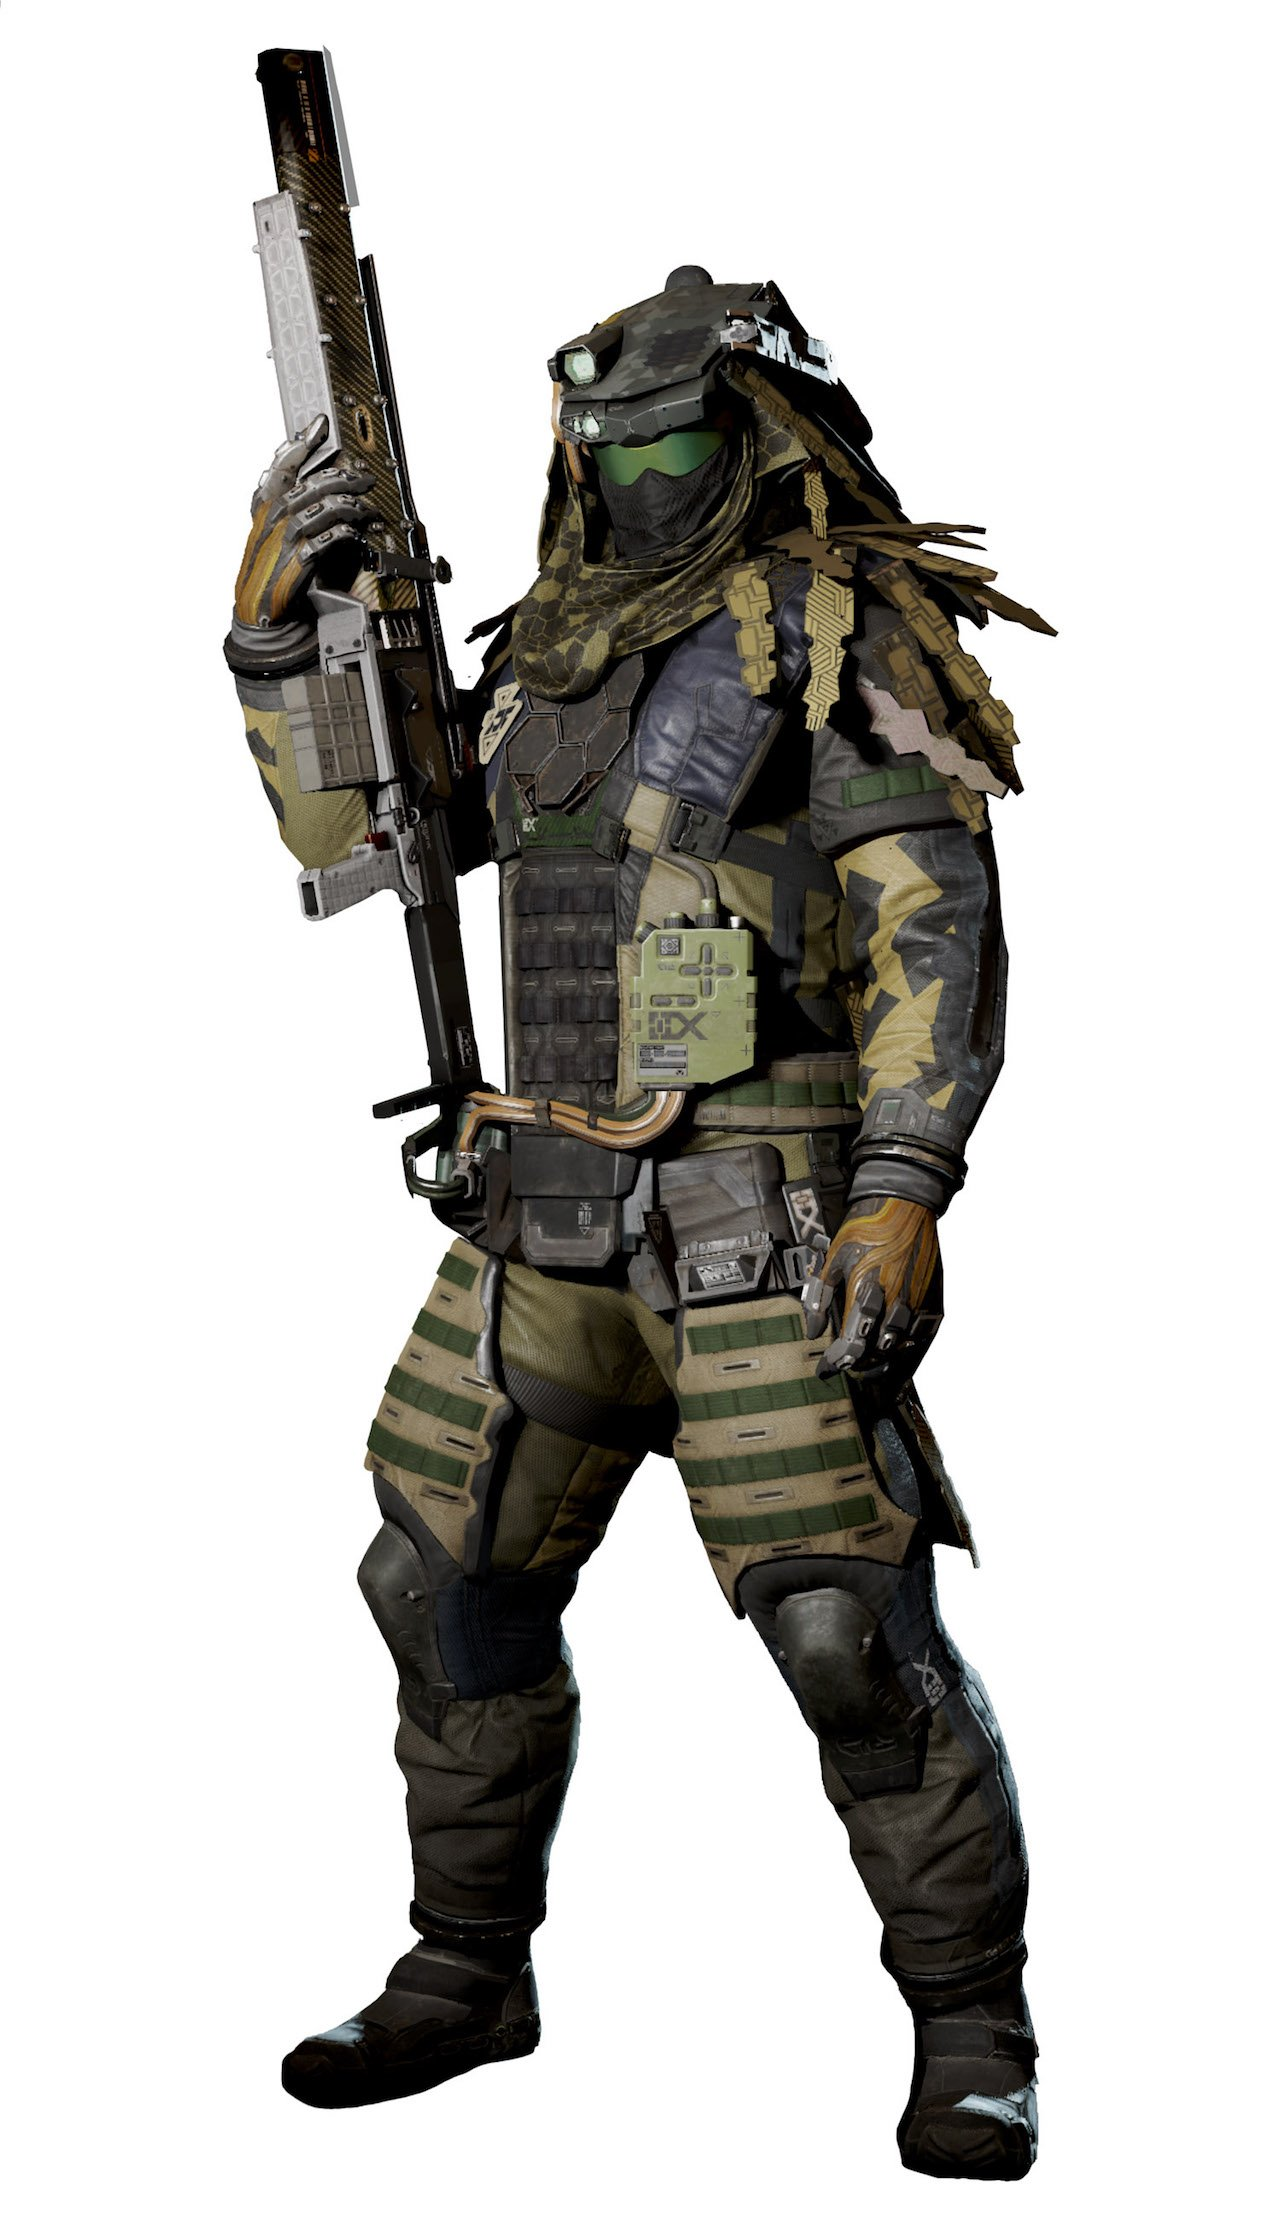 call of duty infinite warfare игромир мультиплеер обзор multiplayer